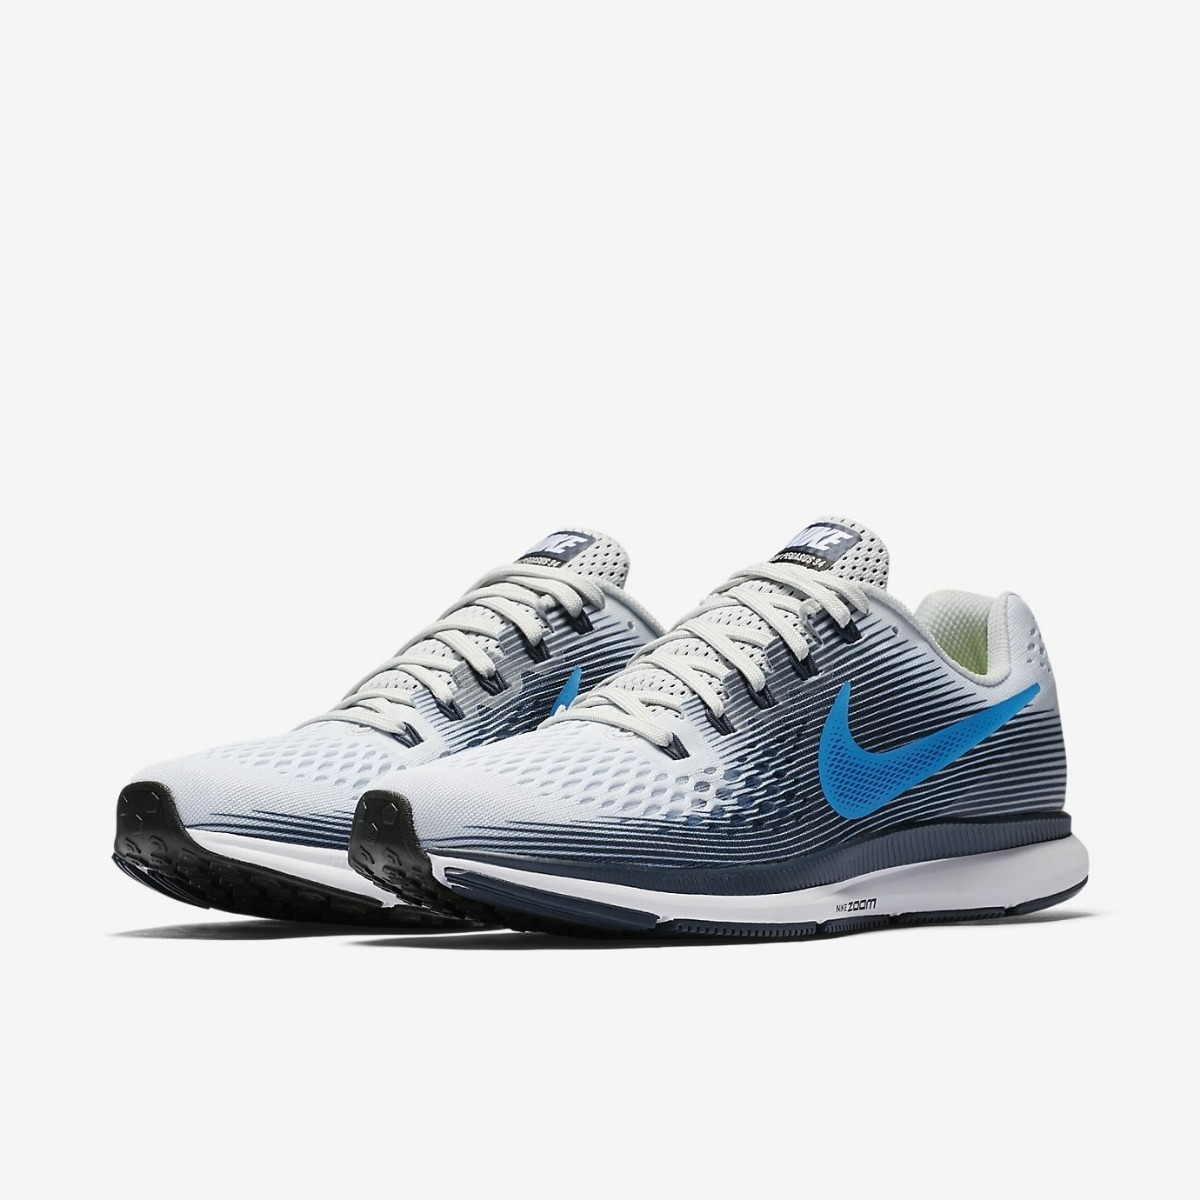 4aa89c9521421 Zapatillas Nike Air Zoom Pegasus 34